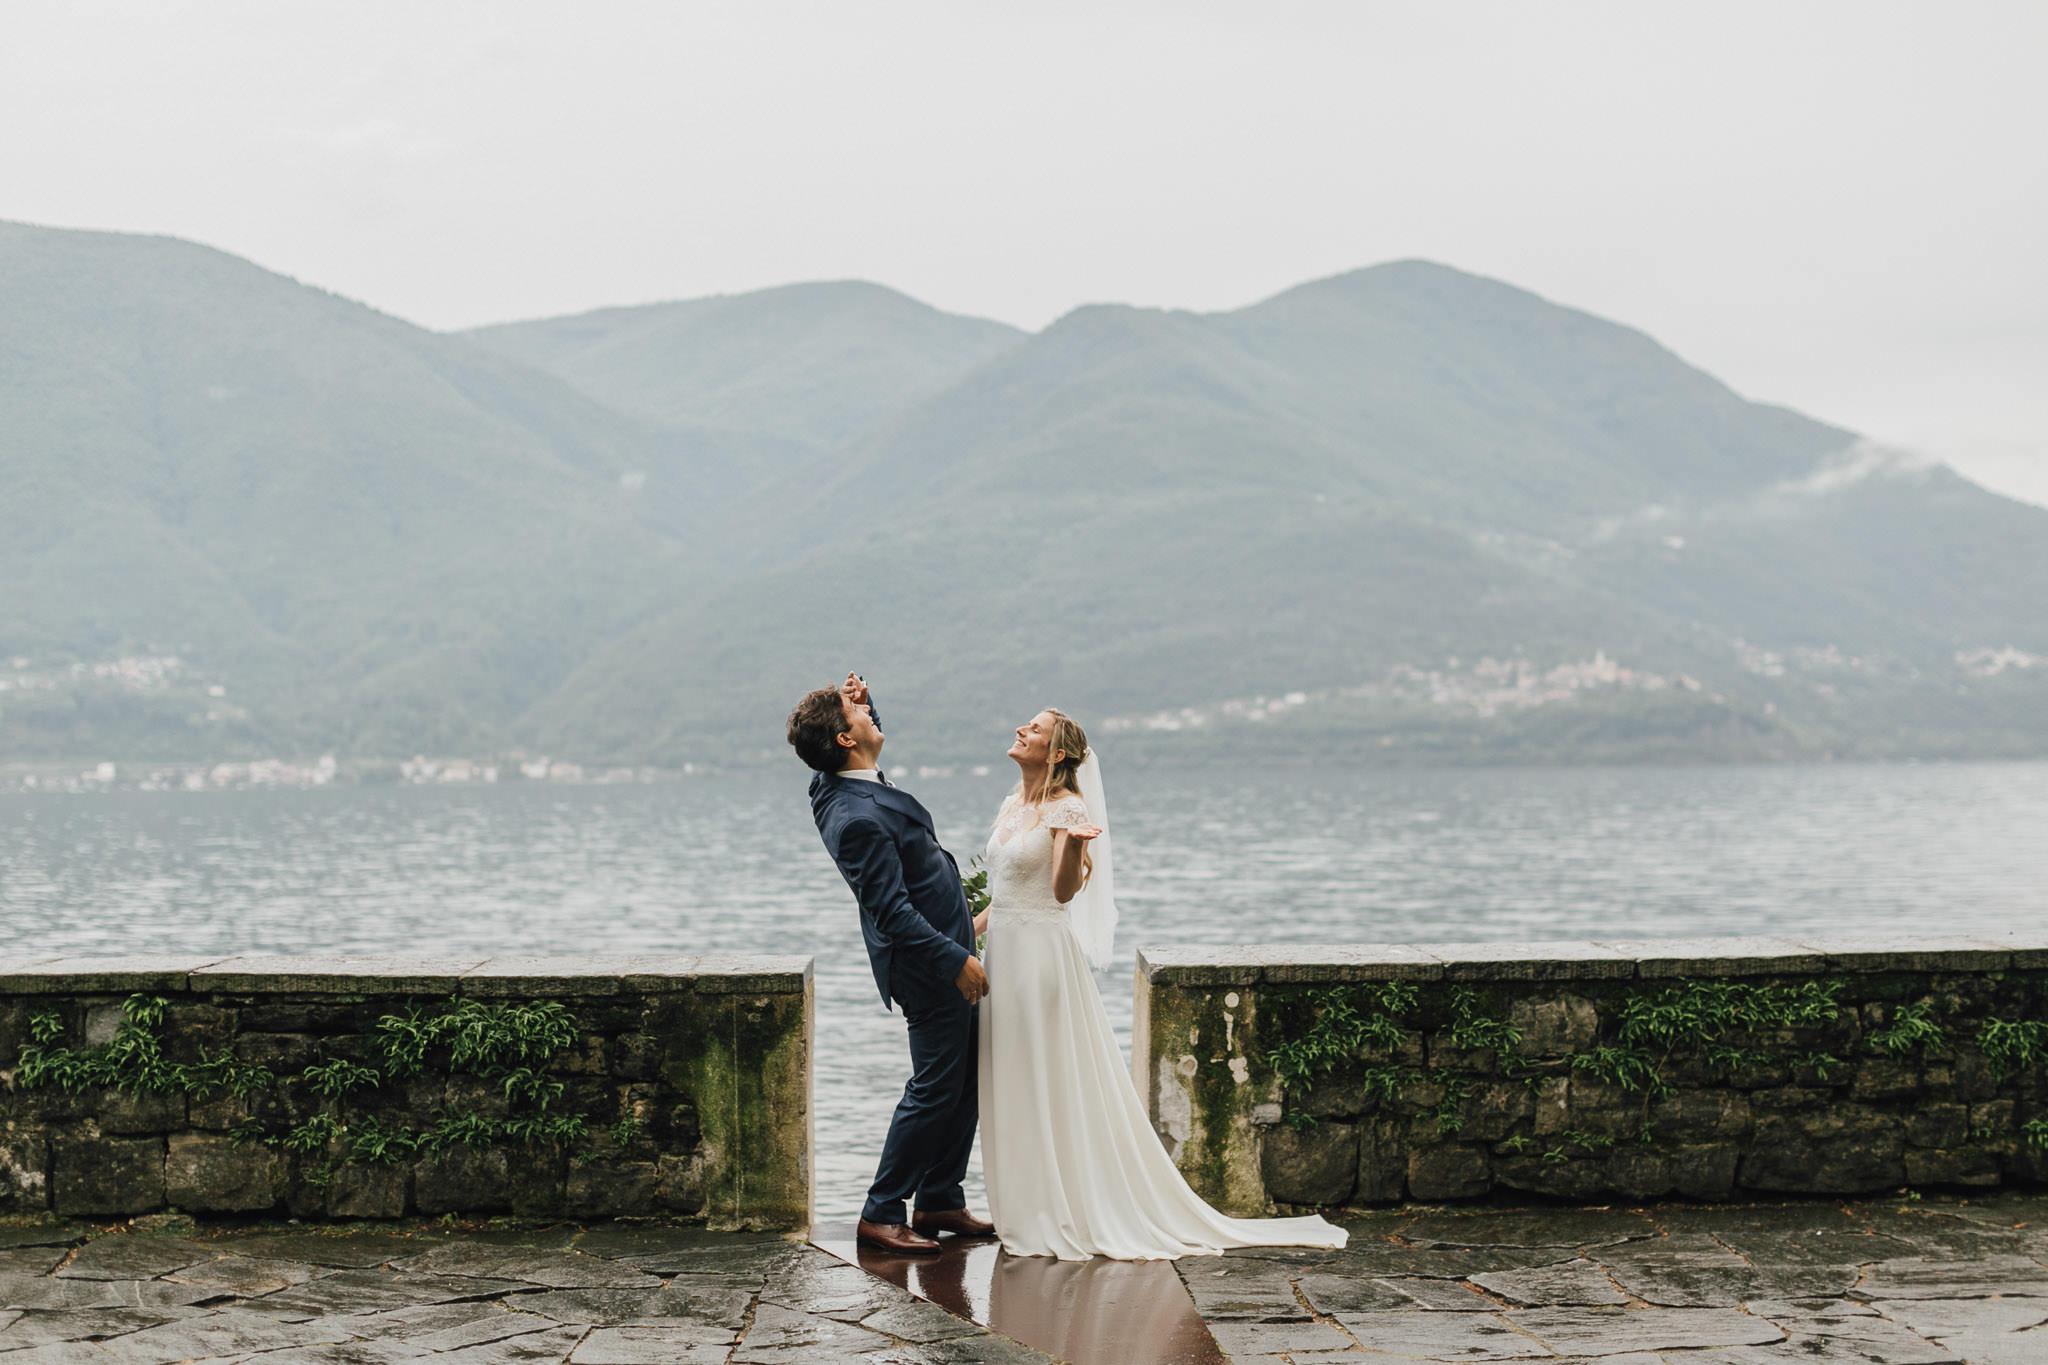 fotografia_di_matrimonio_portfolio-1078